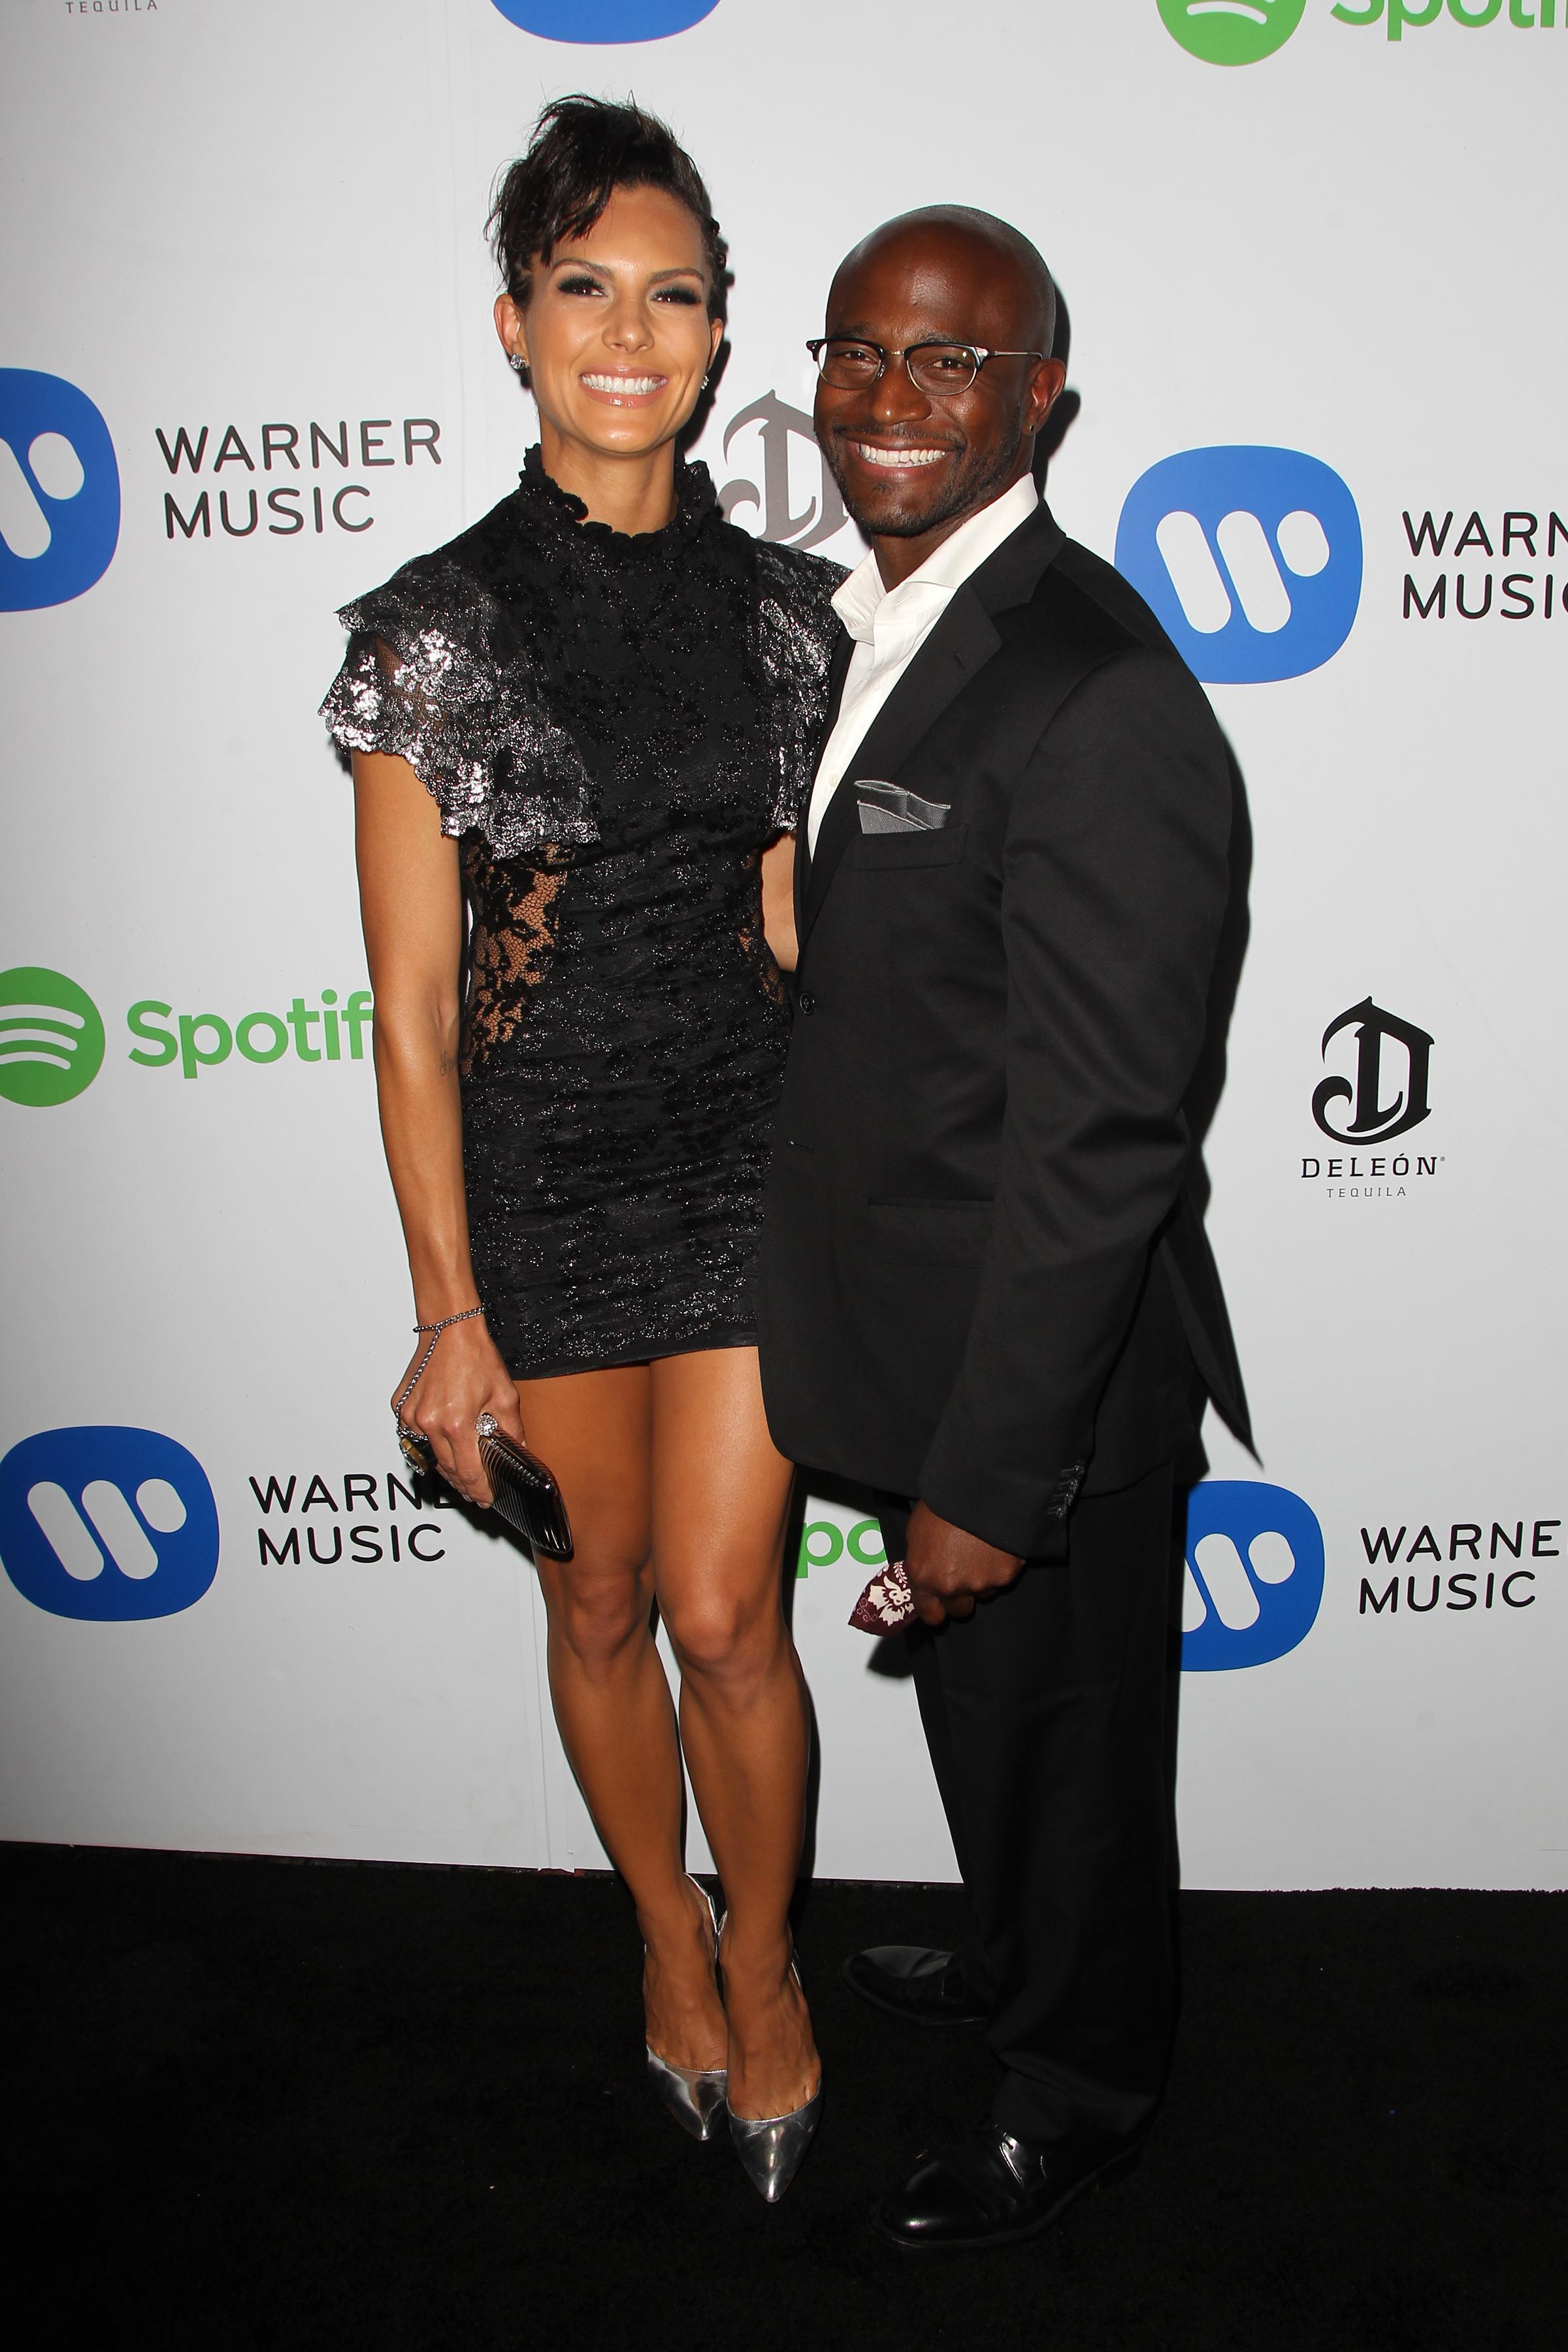 Taye Diggs dating Amanza Brent MasterChef incontri